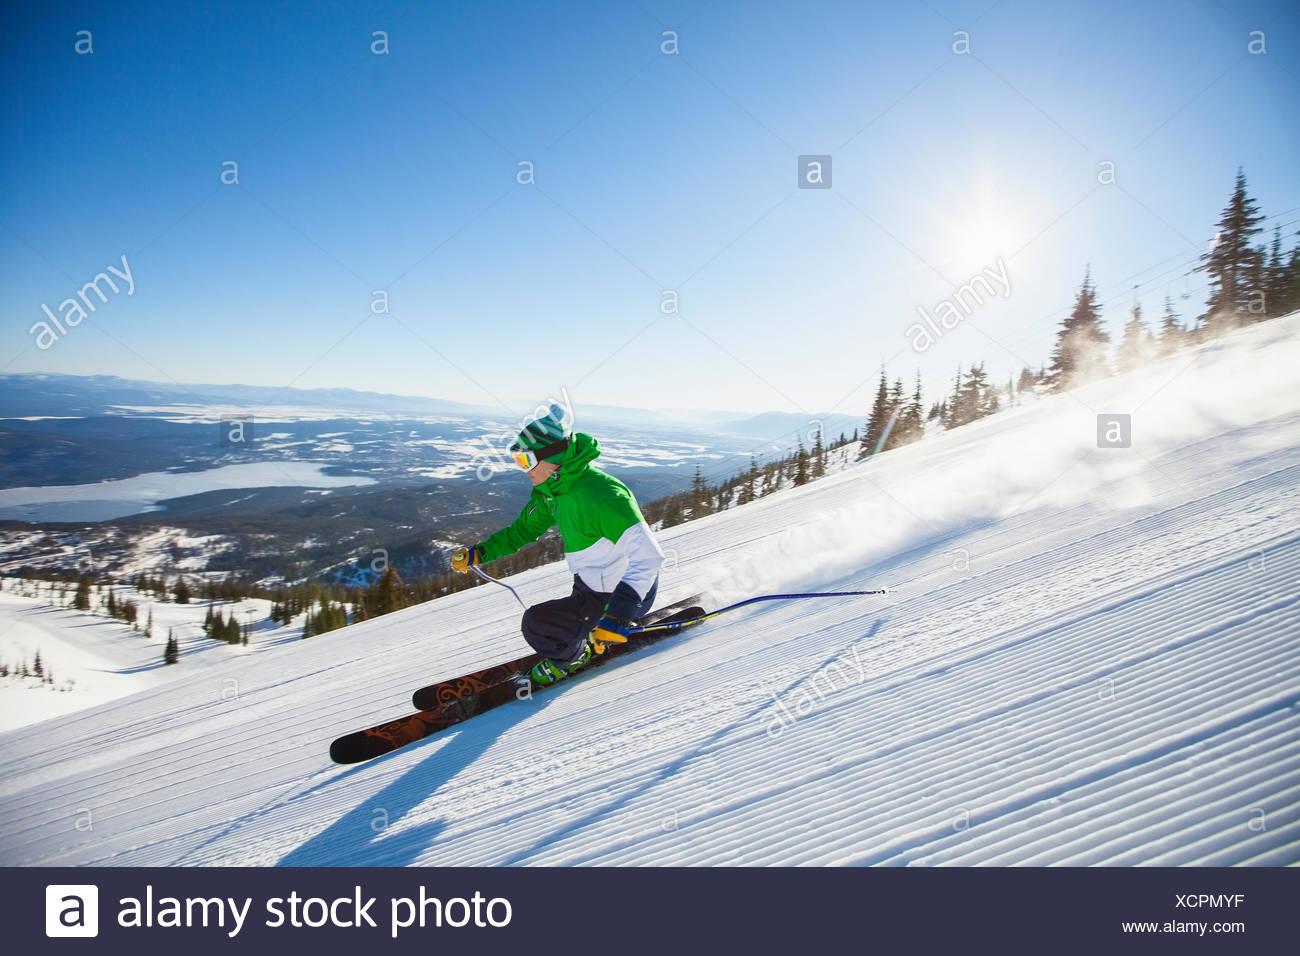 Mature man on ski slope at sunlight - Stock Image